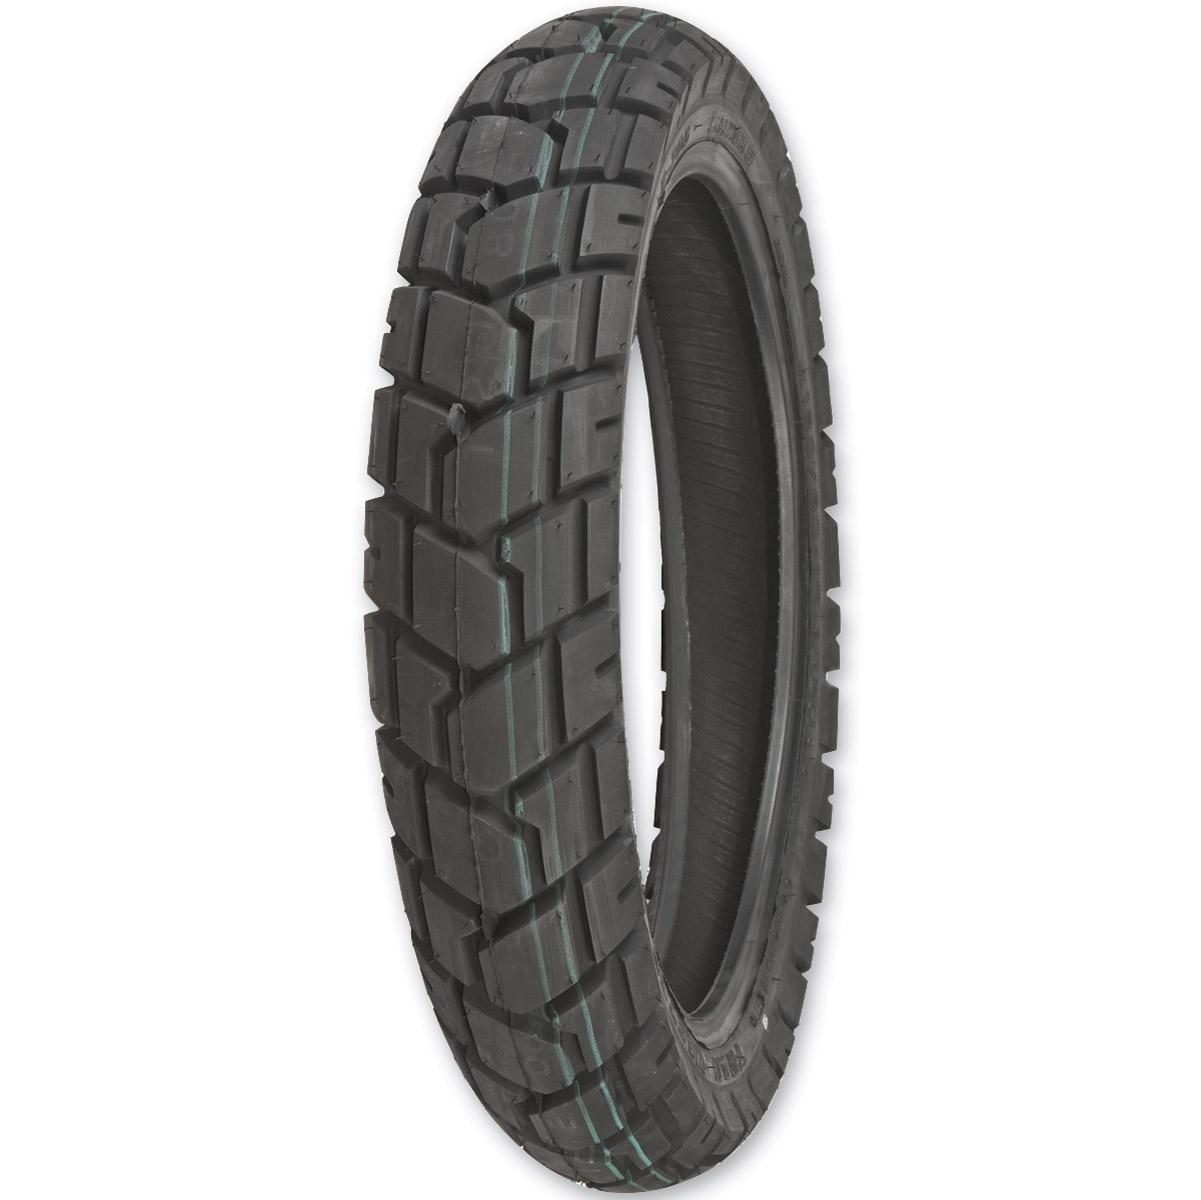 Shinko Tires Review >> Shinko 705 130/90-17 Front/Rear Tire | ZZ32899 | J&P Cycles